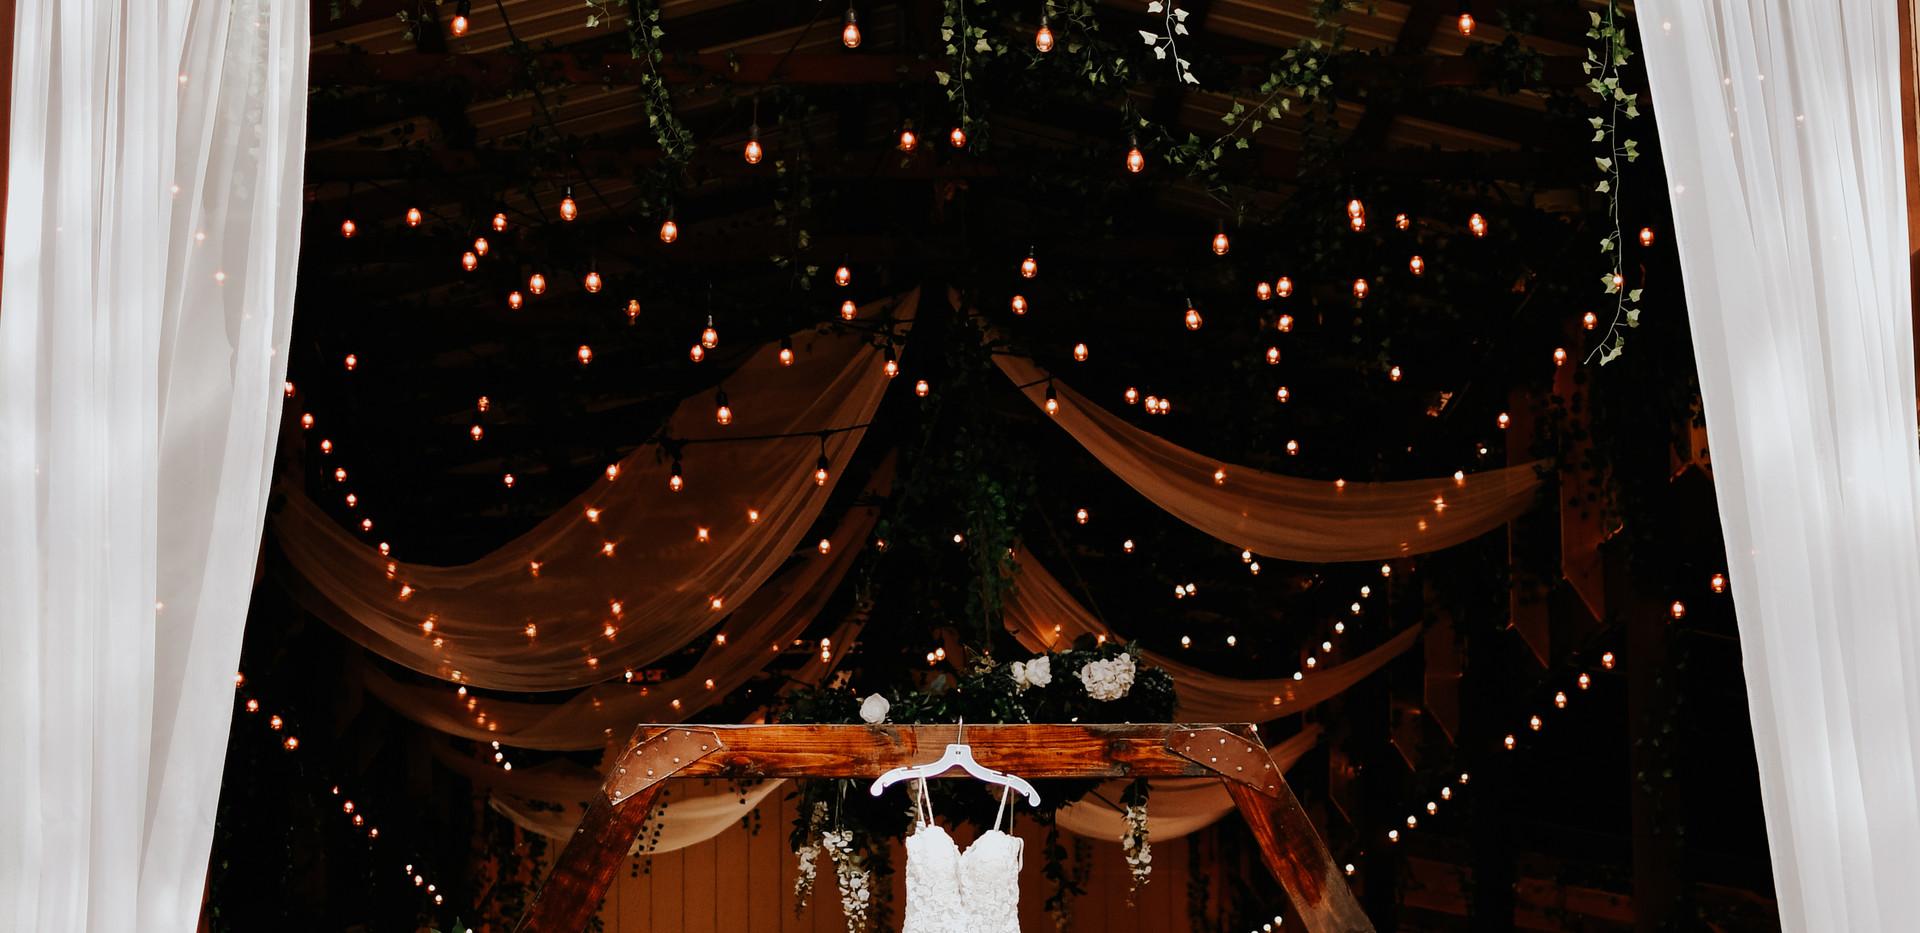 SNEAKS-Chrissyannphotography-13.jpg